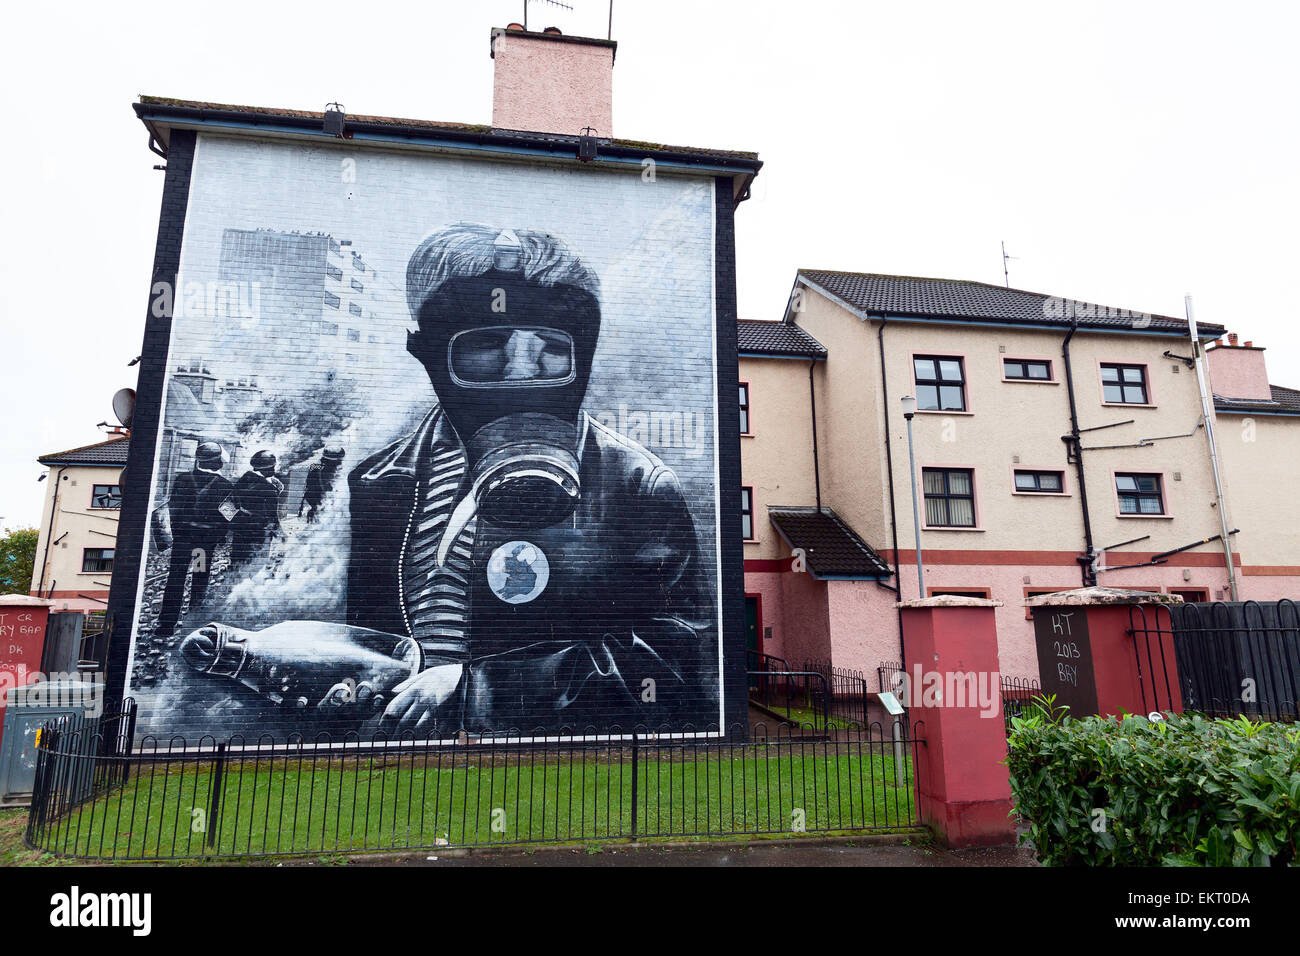 Londonderry, Northern Ireland : petrol bomber mural - Stock Image